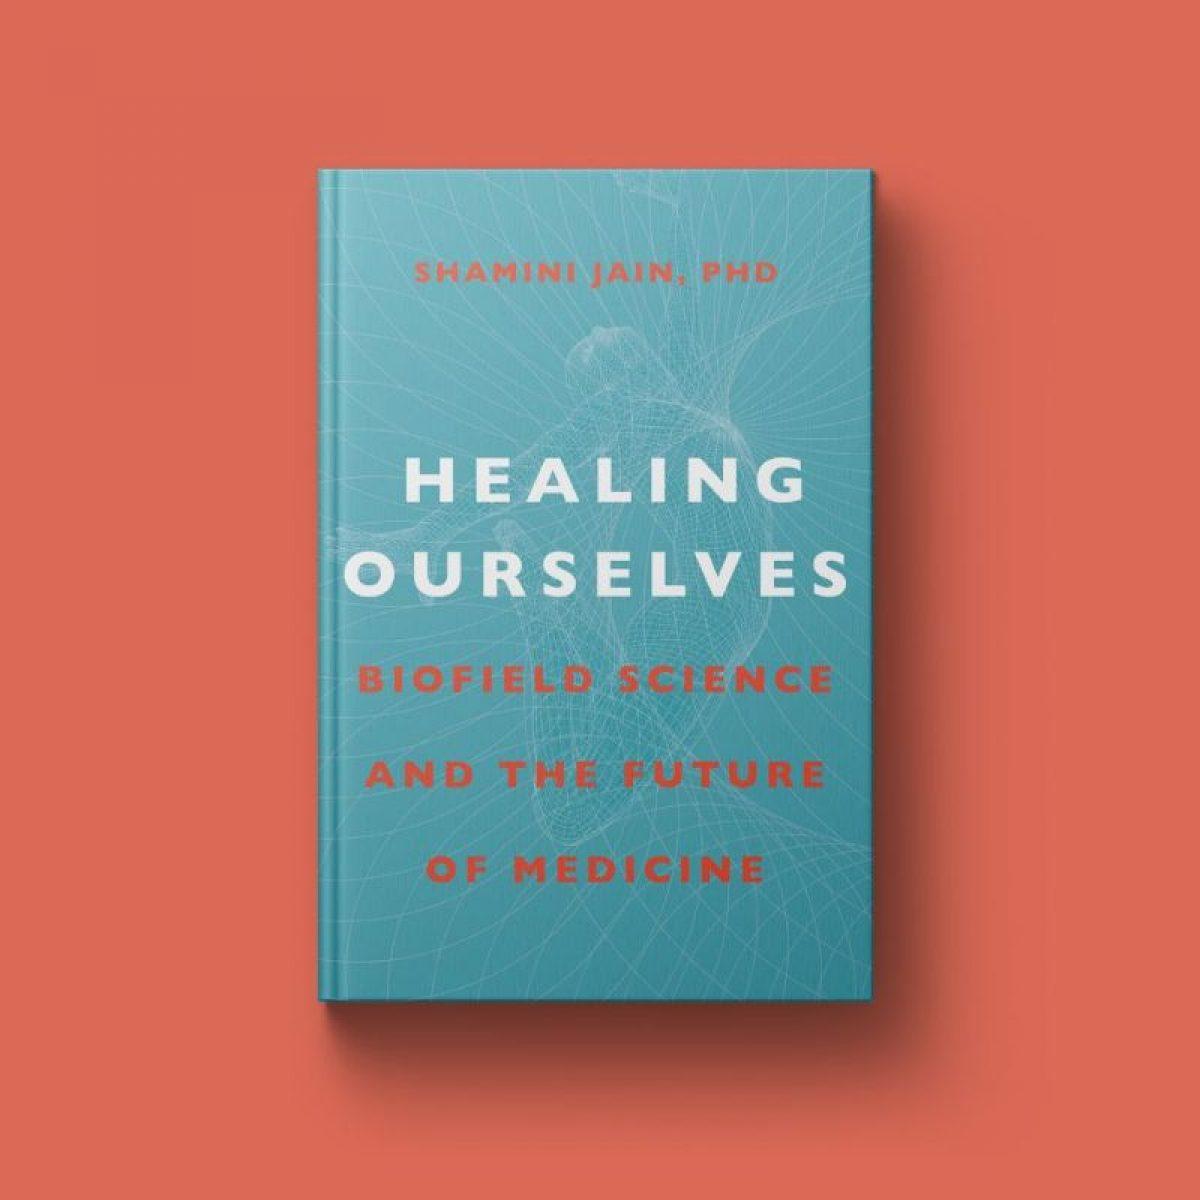 healing-ourselves-shamini-jain-cover-art-1